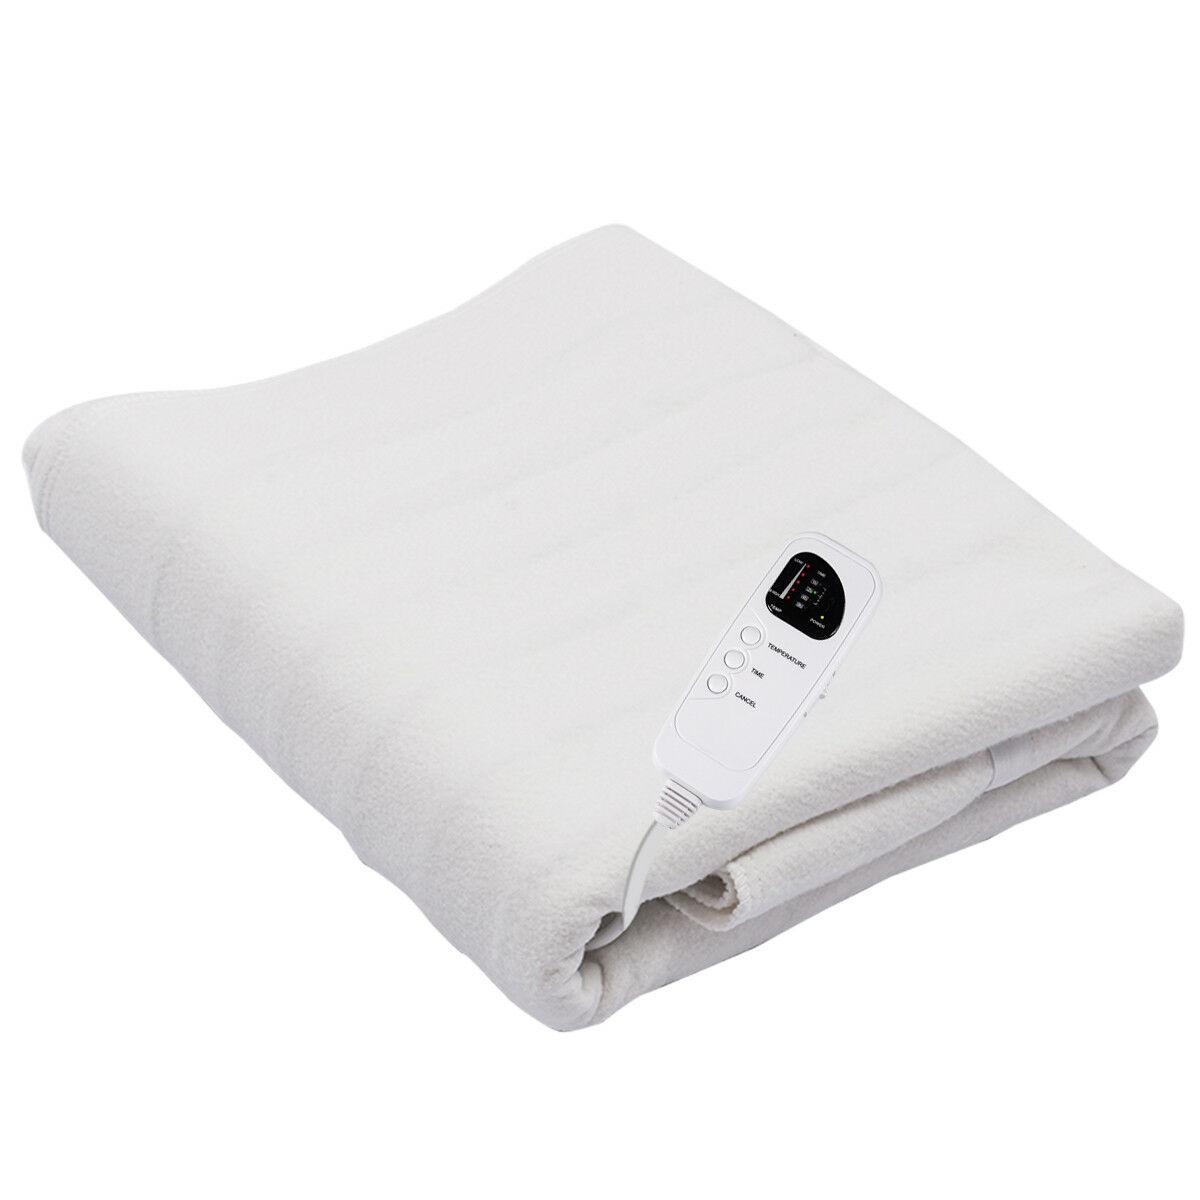 Digital Massage Table Warmer Warming Pad Heat Settings Auto